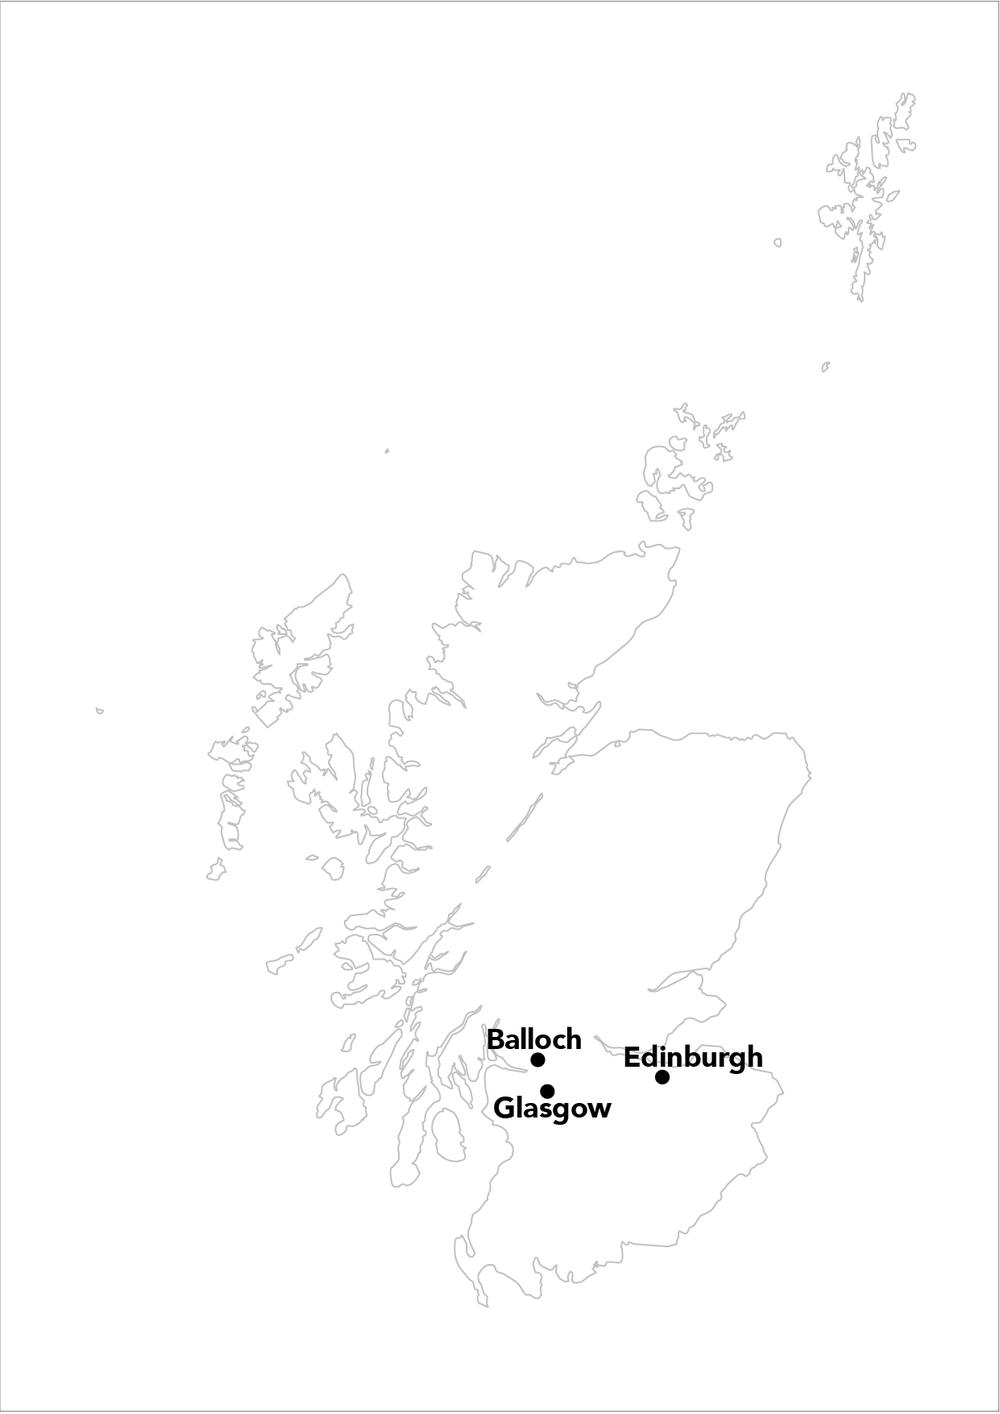 SCOTLAND-MAP-04-04.png